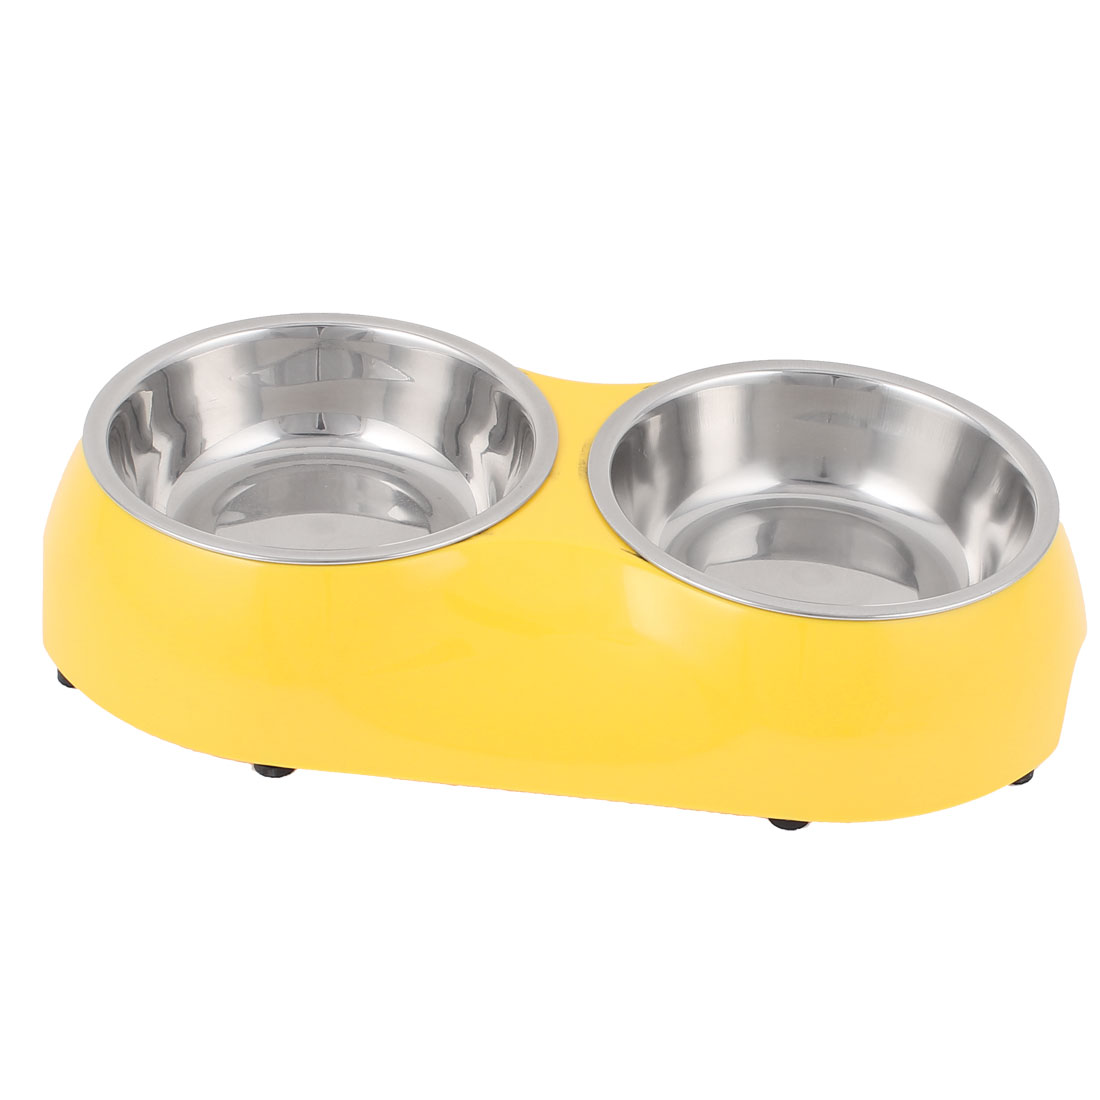 Pet Dog Puppy Plastic Dish Food Water Feeding Feeder Double Bowl Yellow